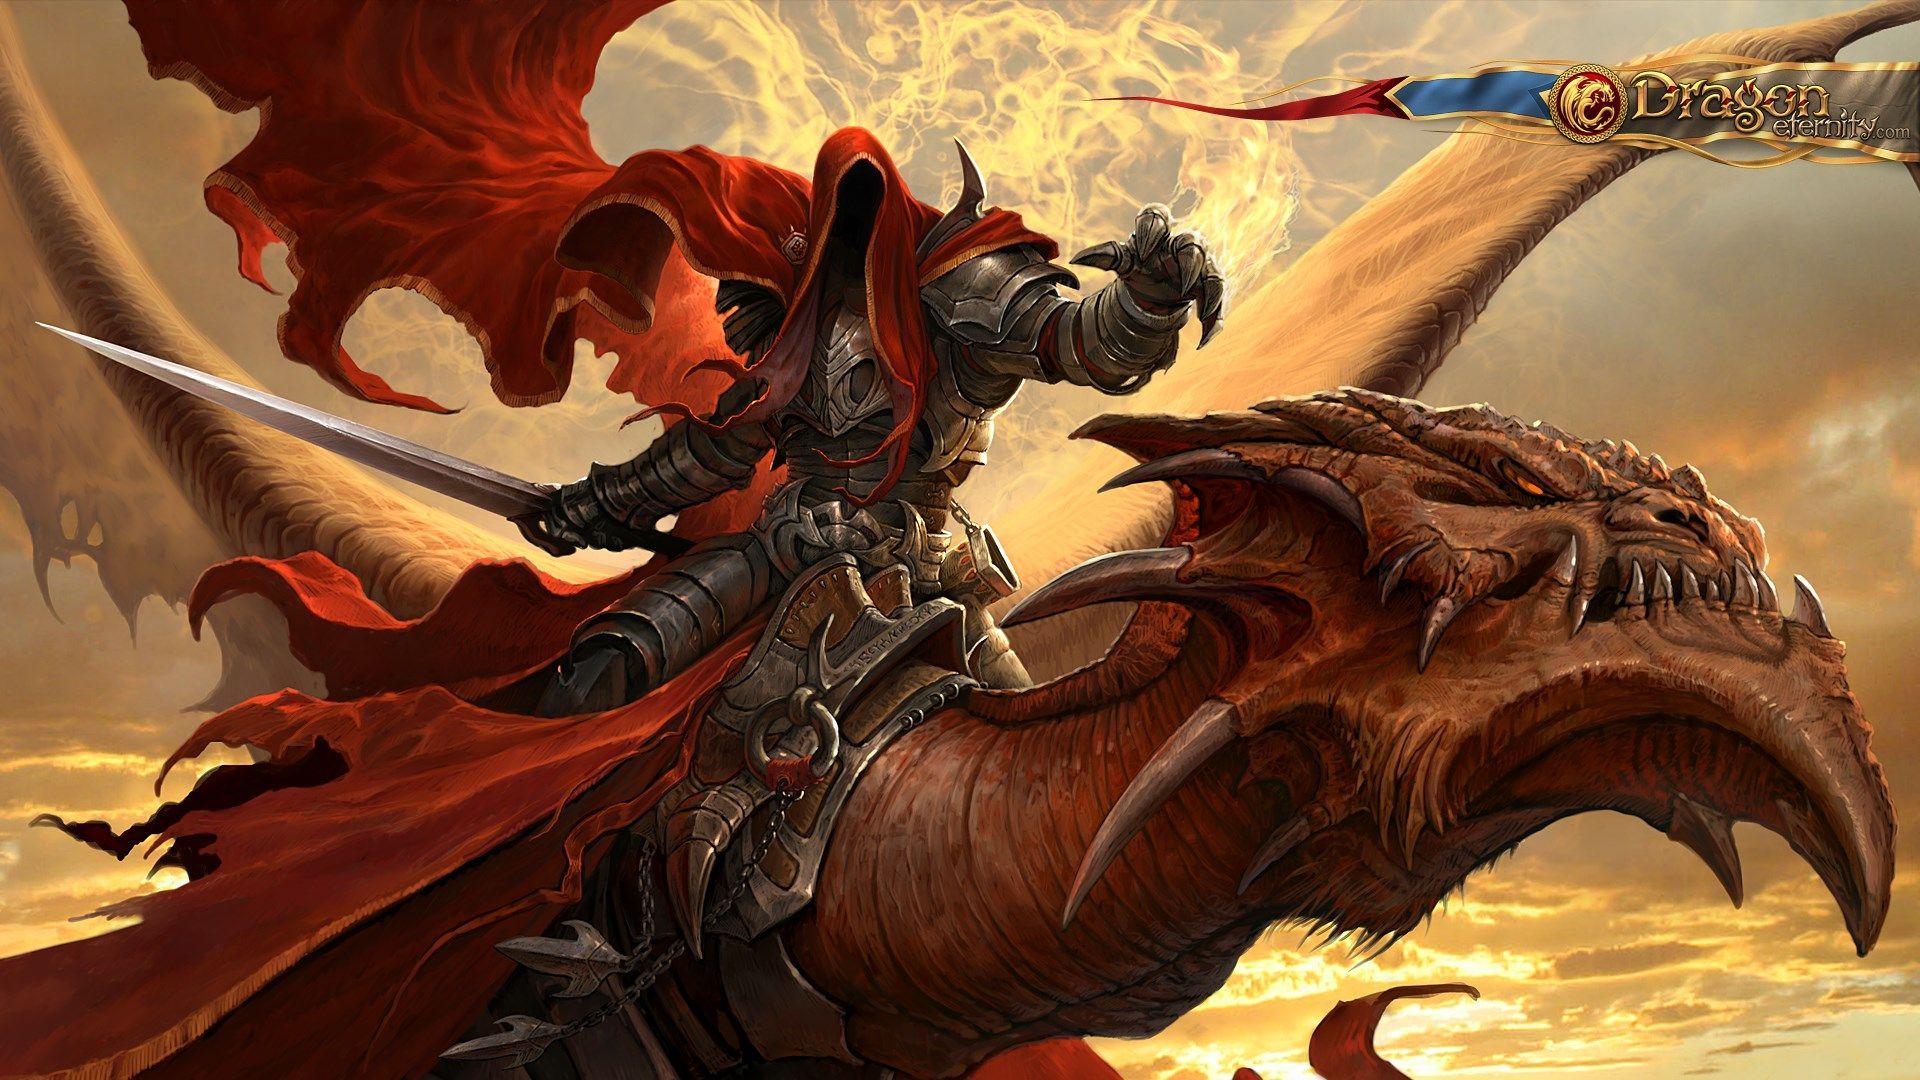 dragons screensavers www